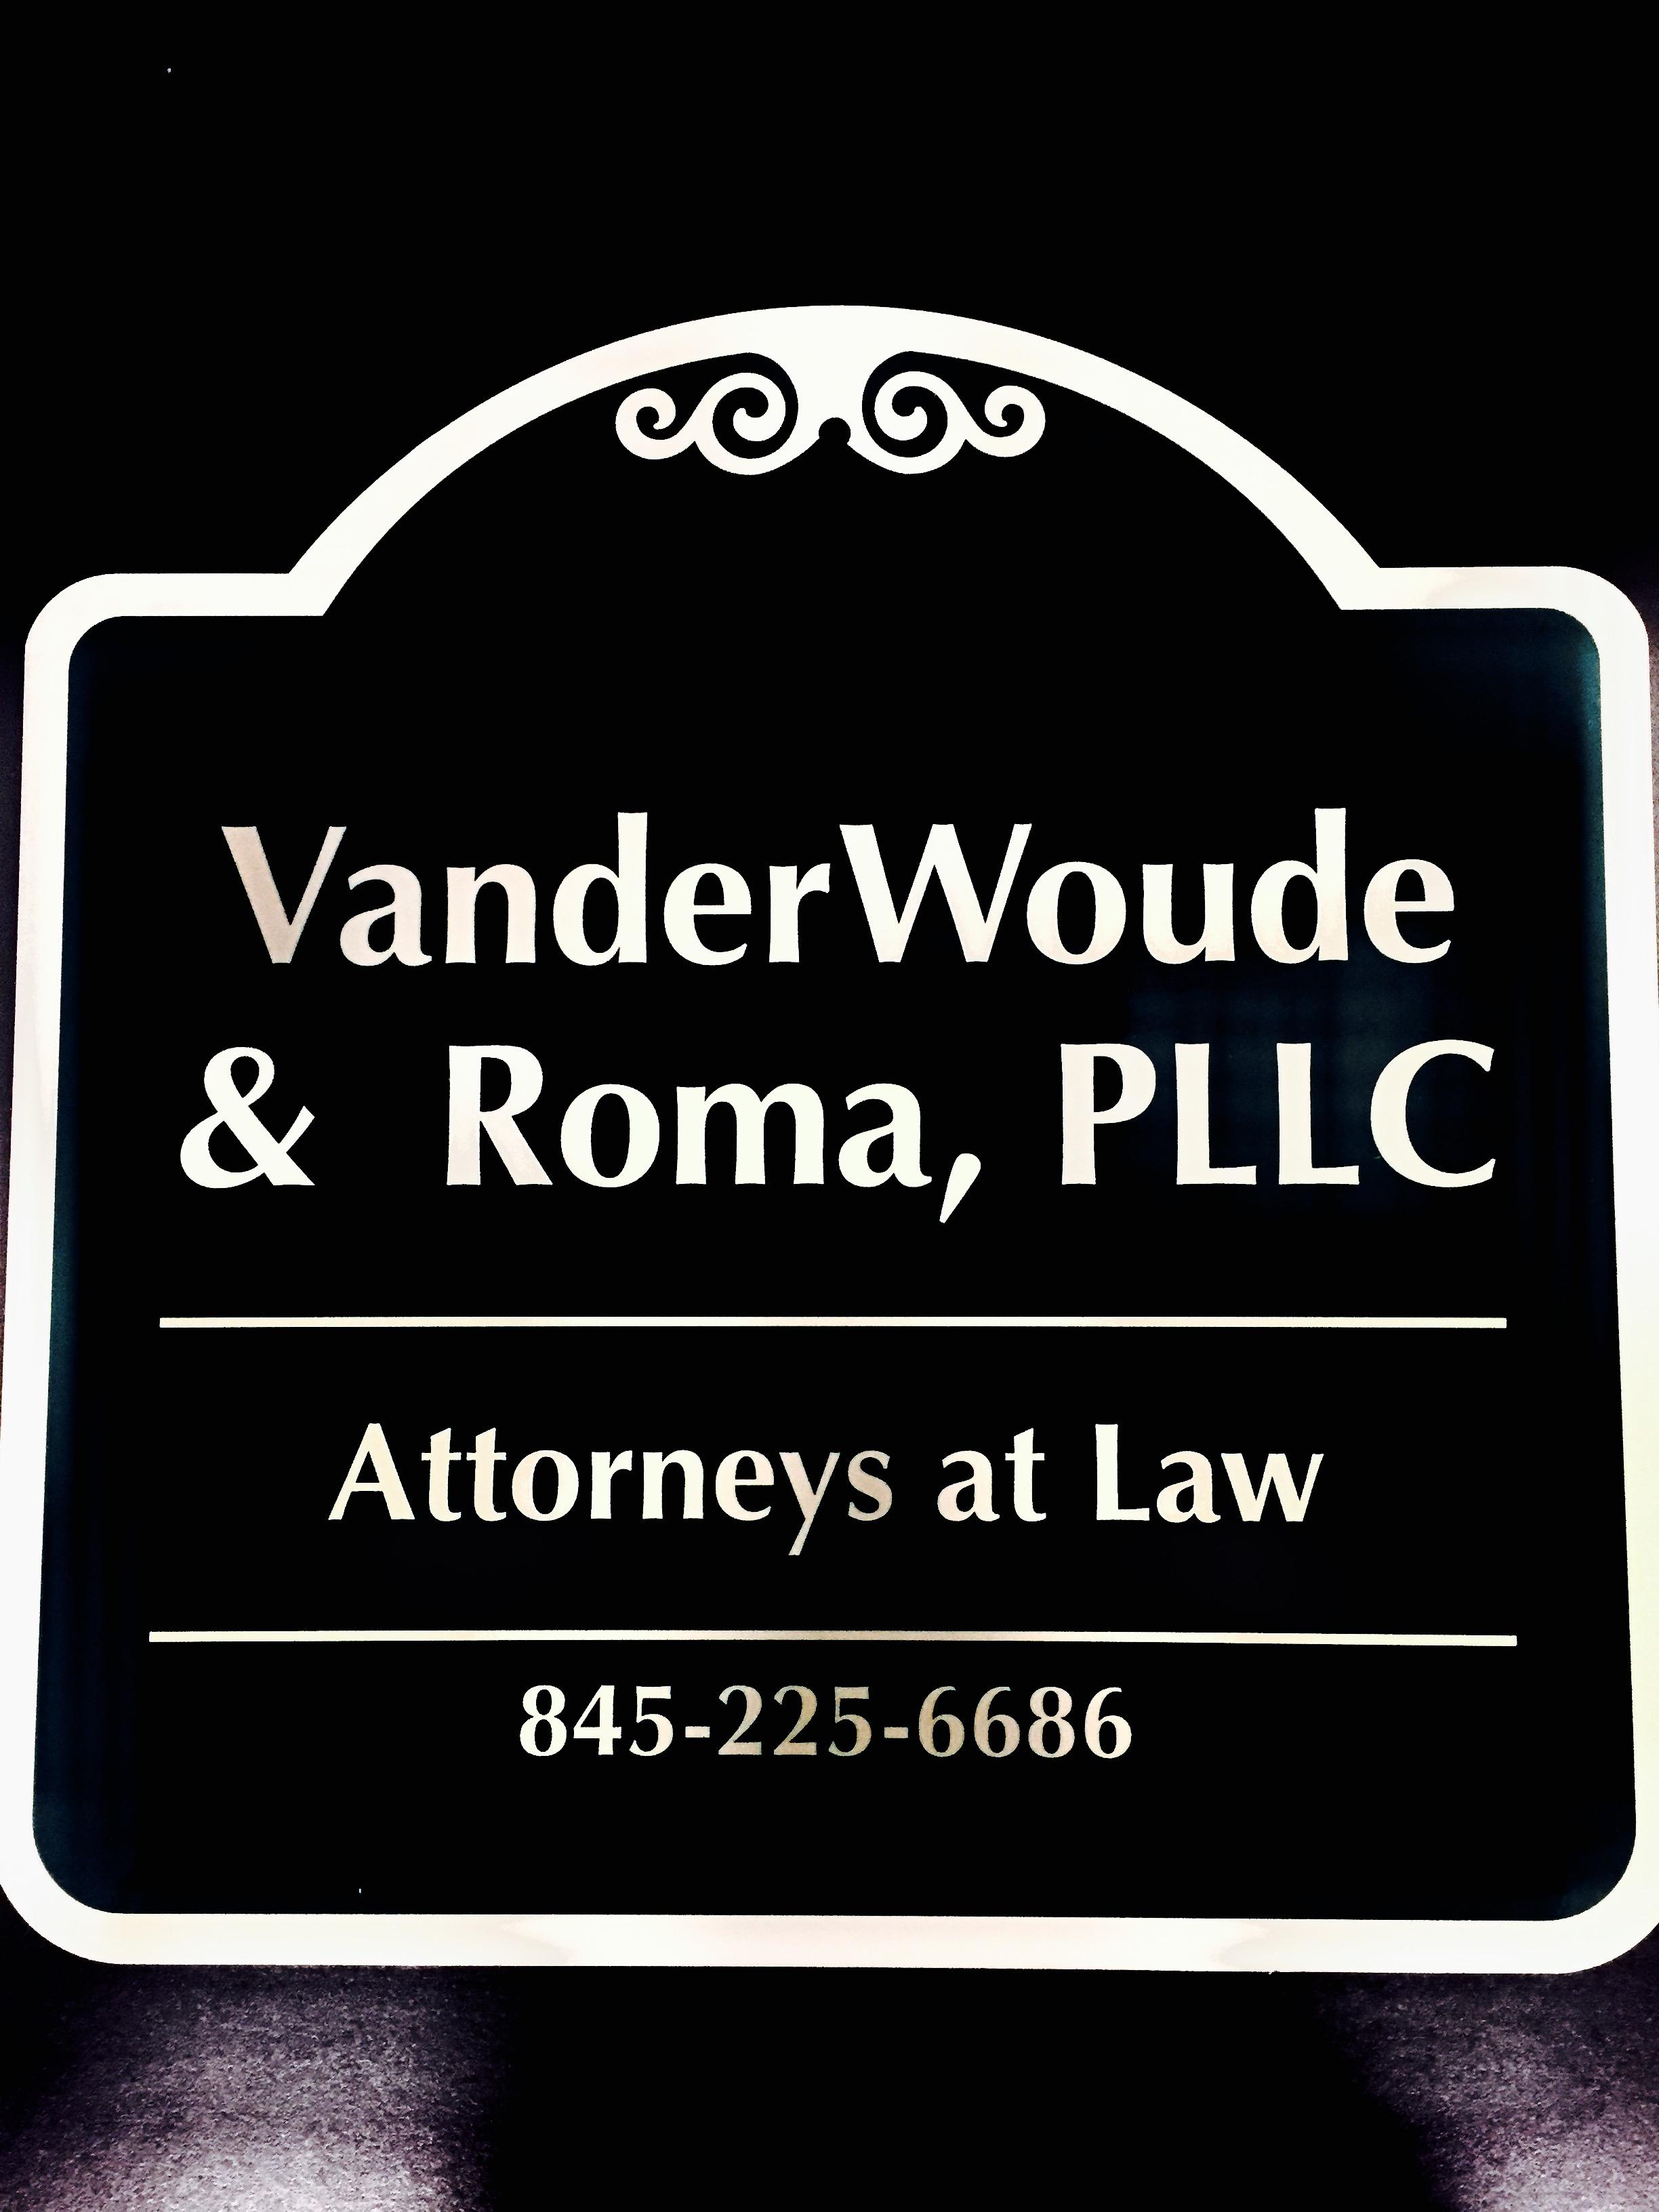 Vanderwoude Roma Pllc Stormville Ny Lawyers